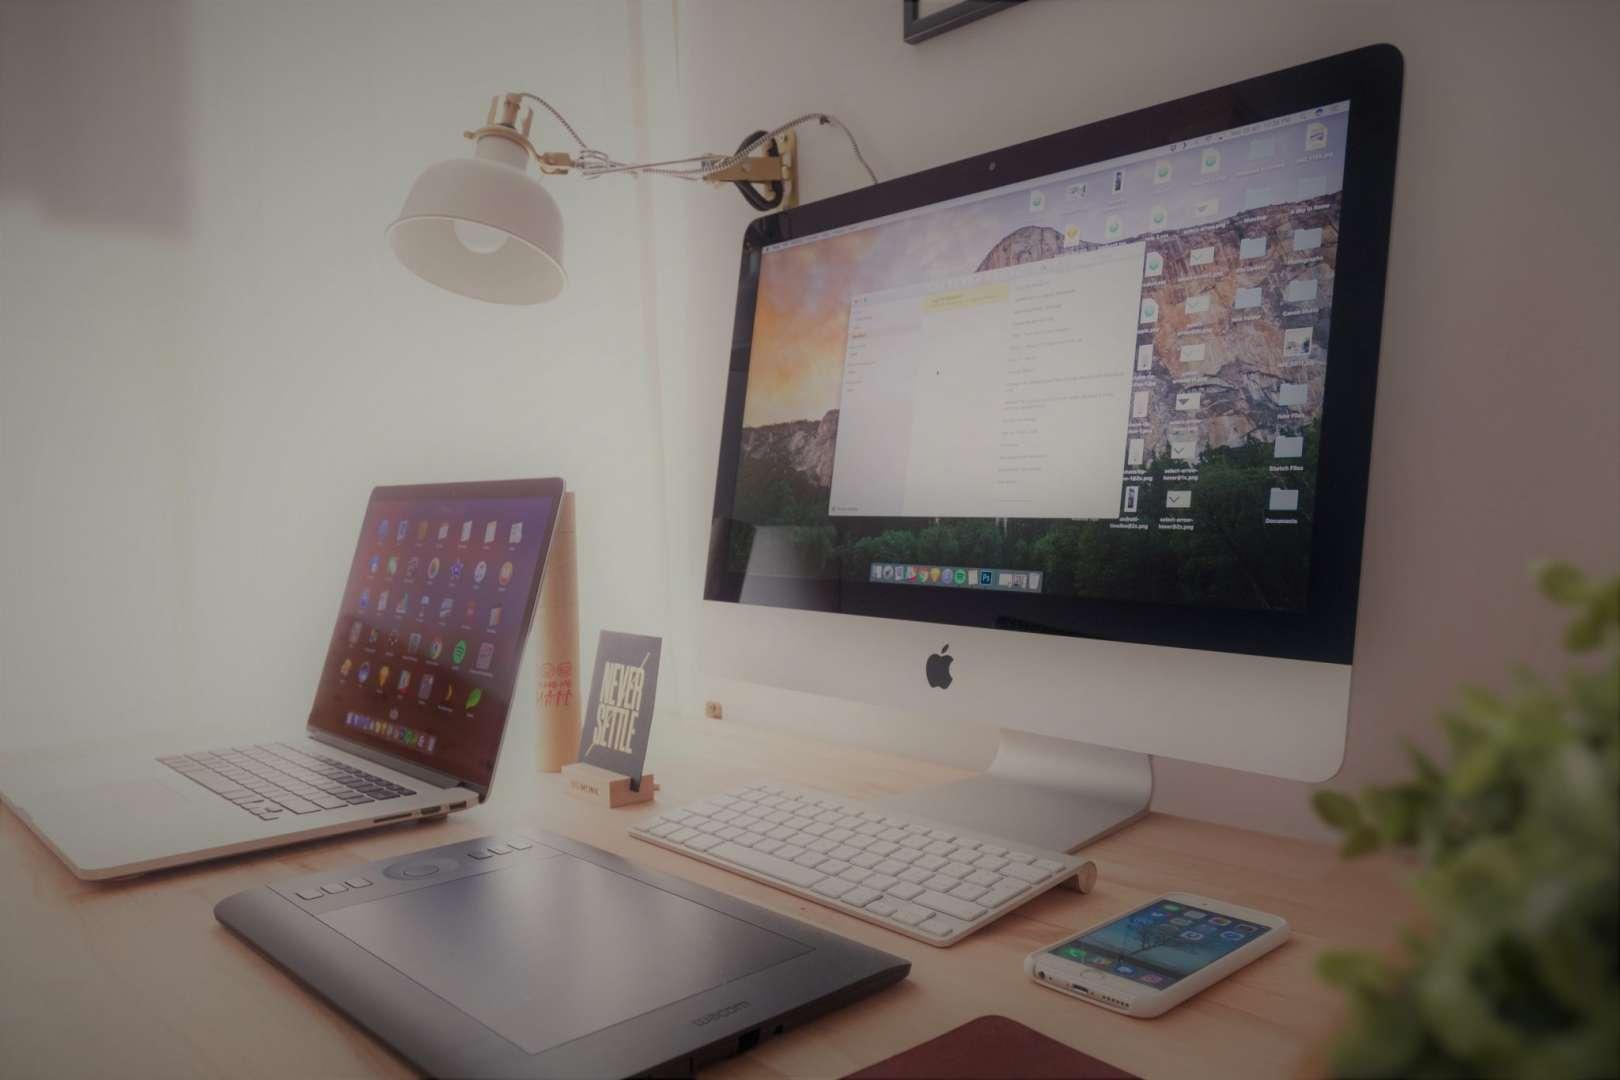 Tour Operator Software Running on an iMac